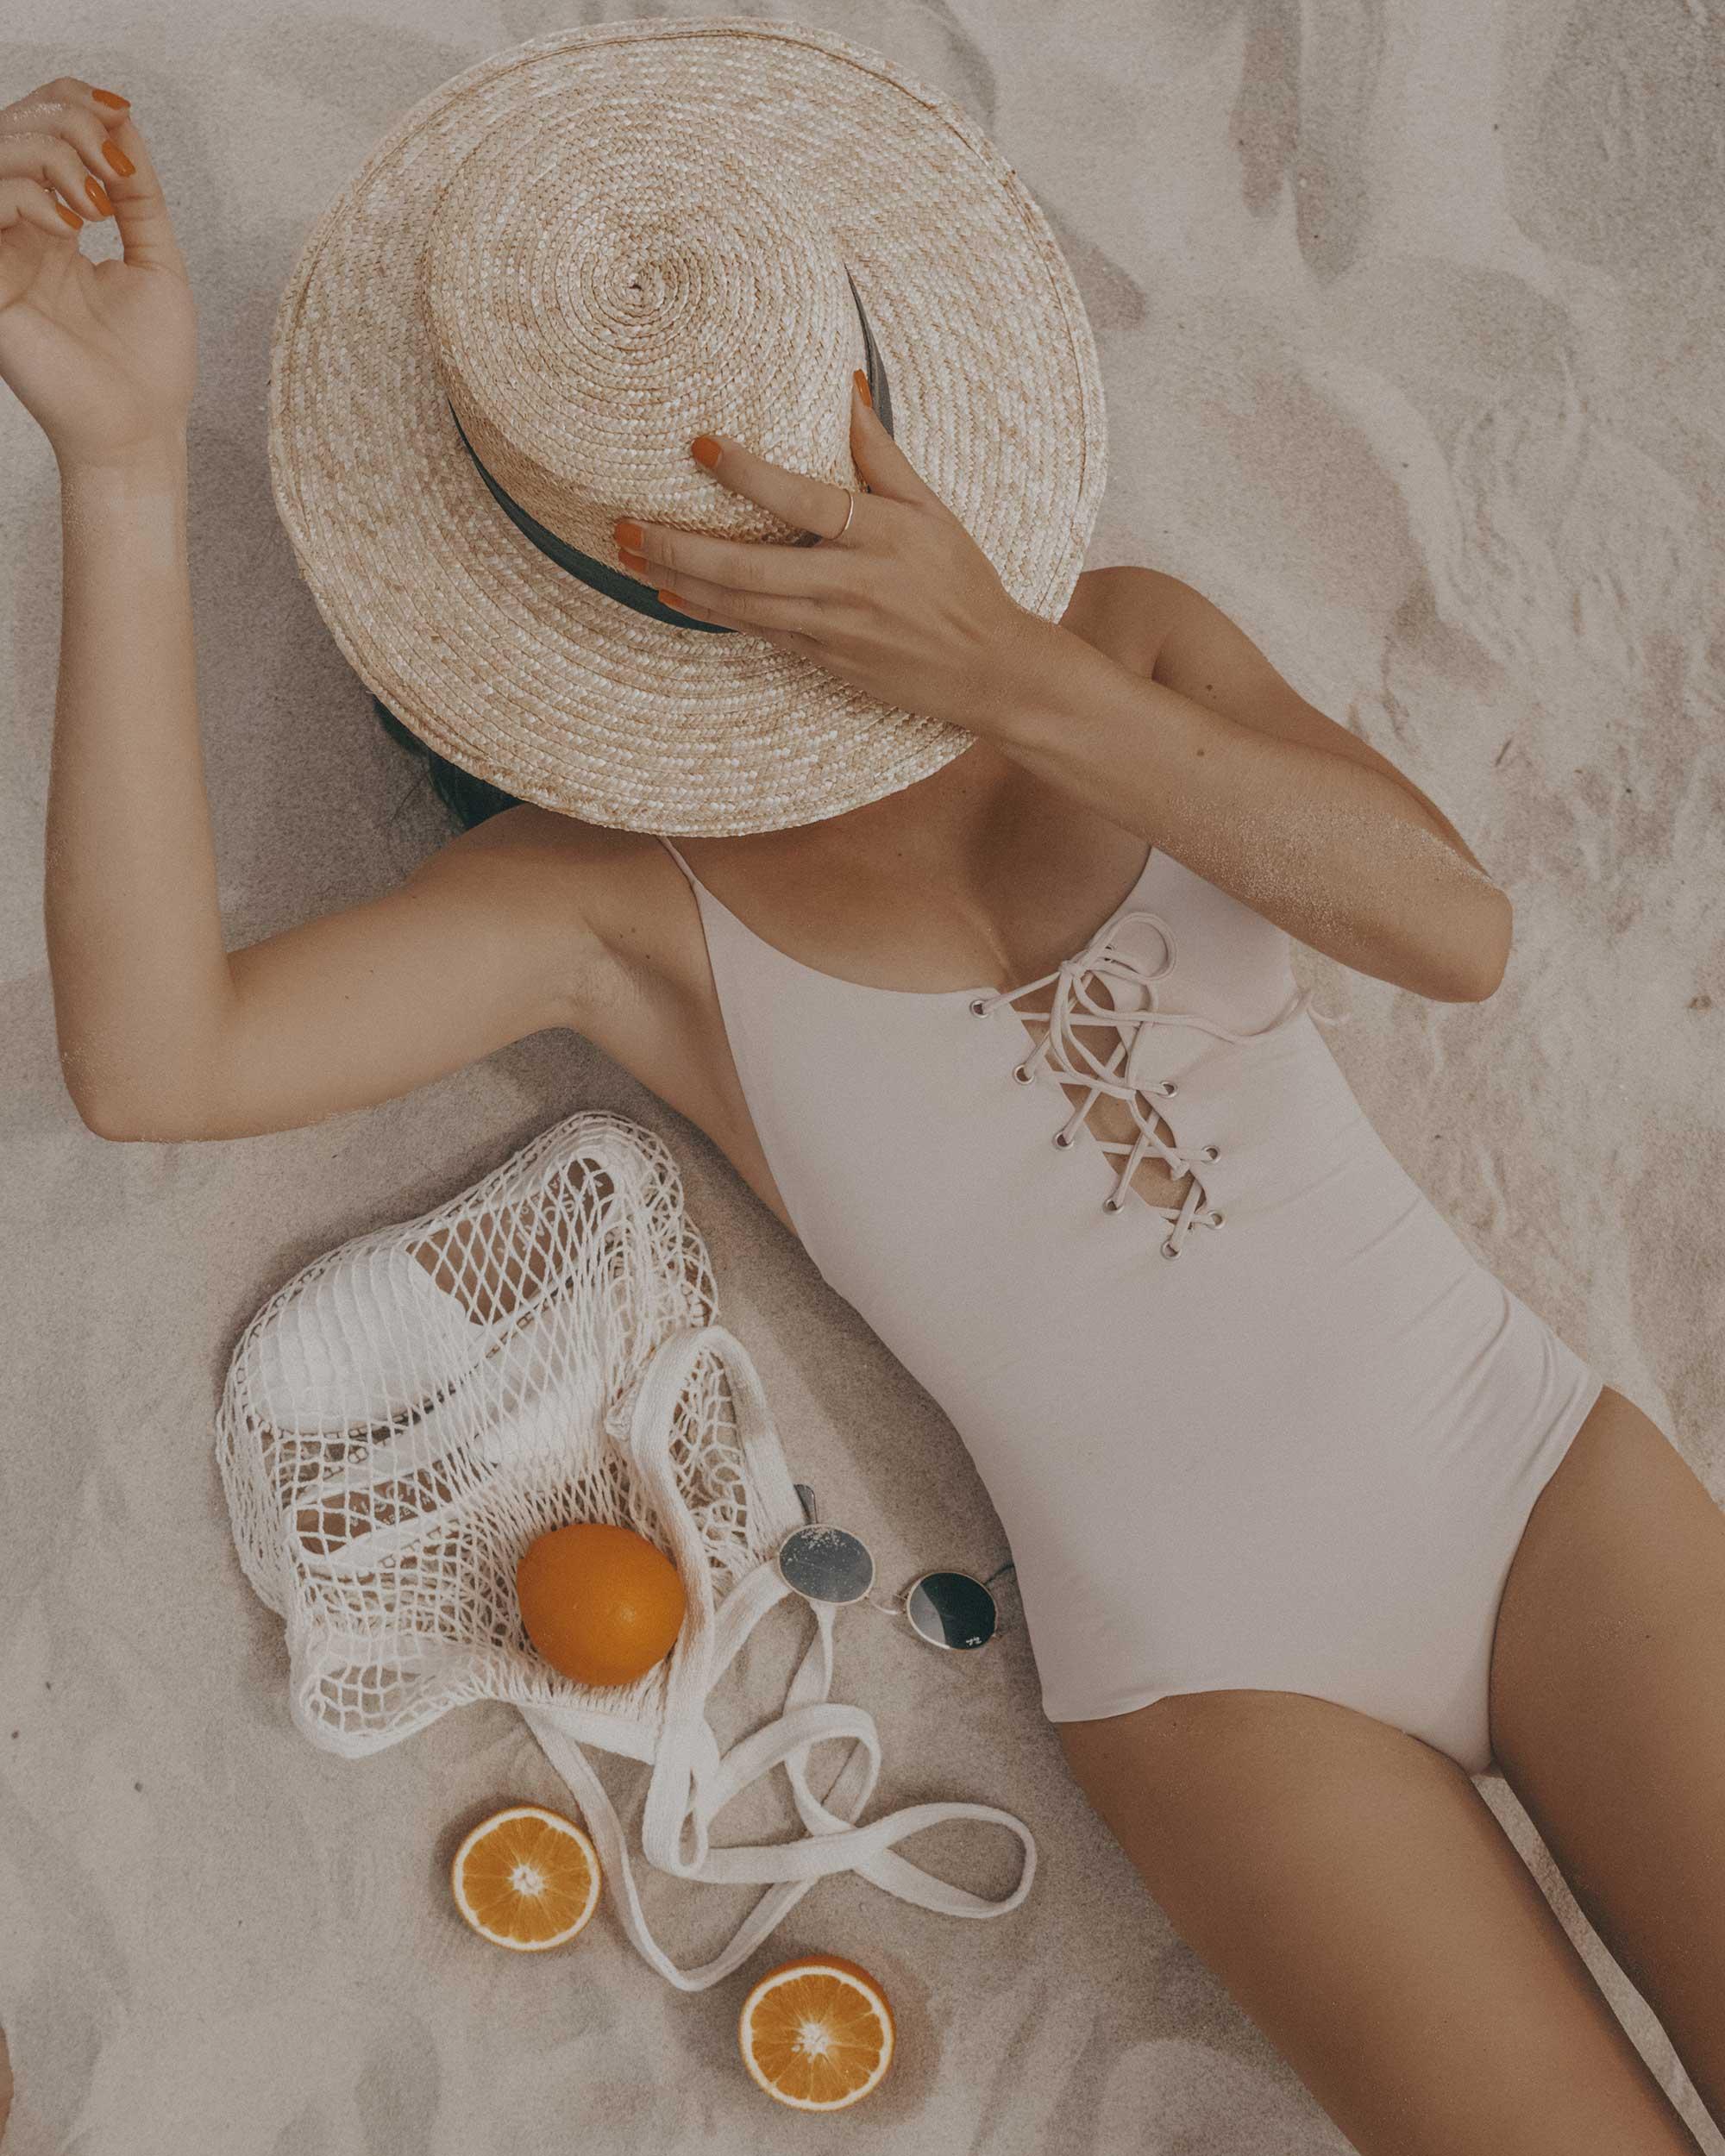 Tavik-swimwear-lace-up-front-one-piece-swimsuit-newport-beach-california-12.jpg